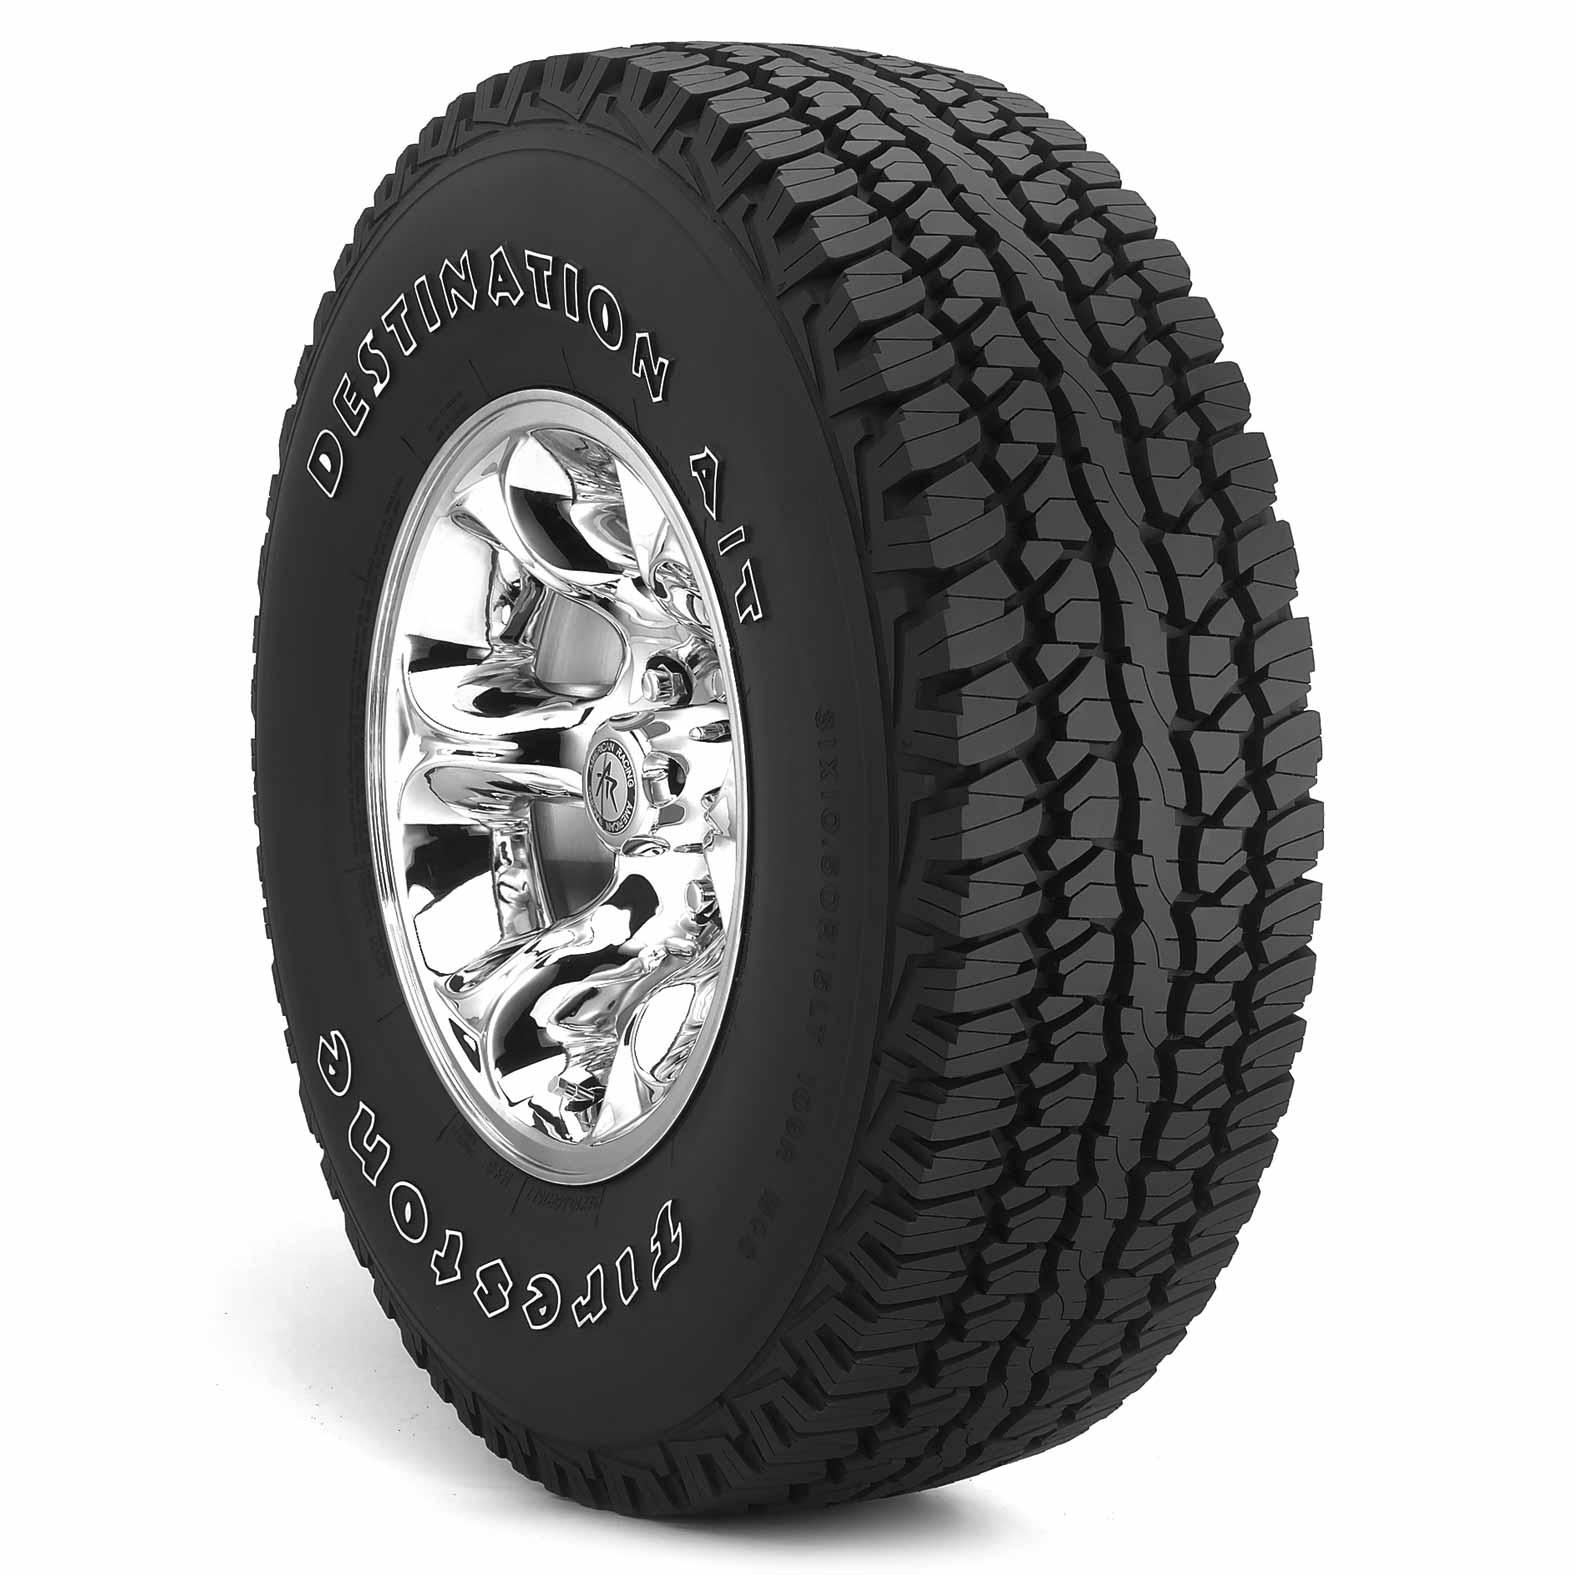 Firestone Destination At Reviews >> Firestone DESTINATION A/T tires